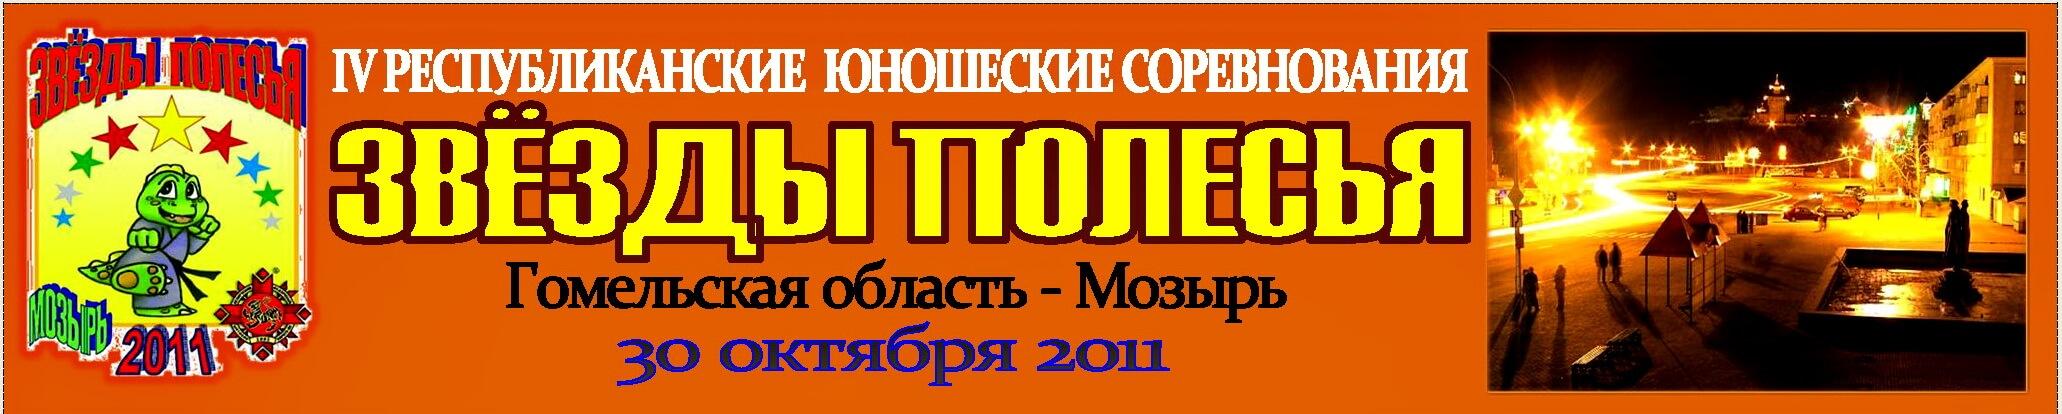 Мозырь-2011 Баннер